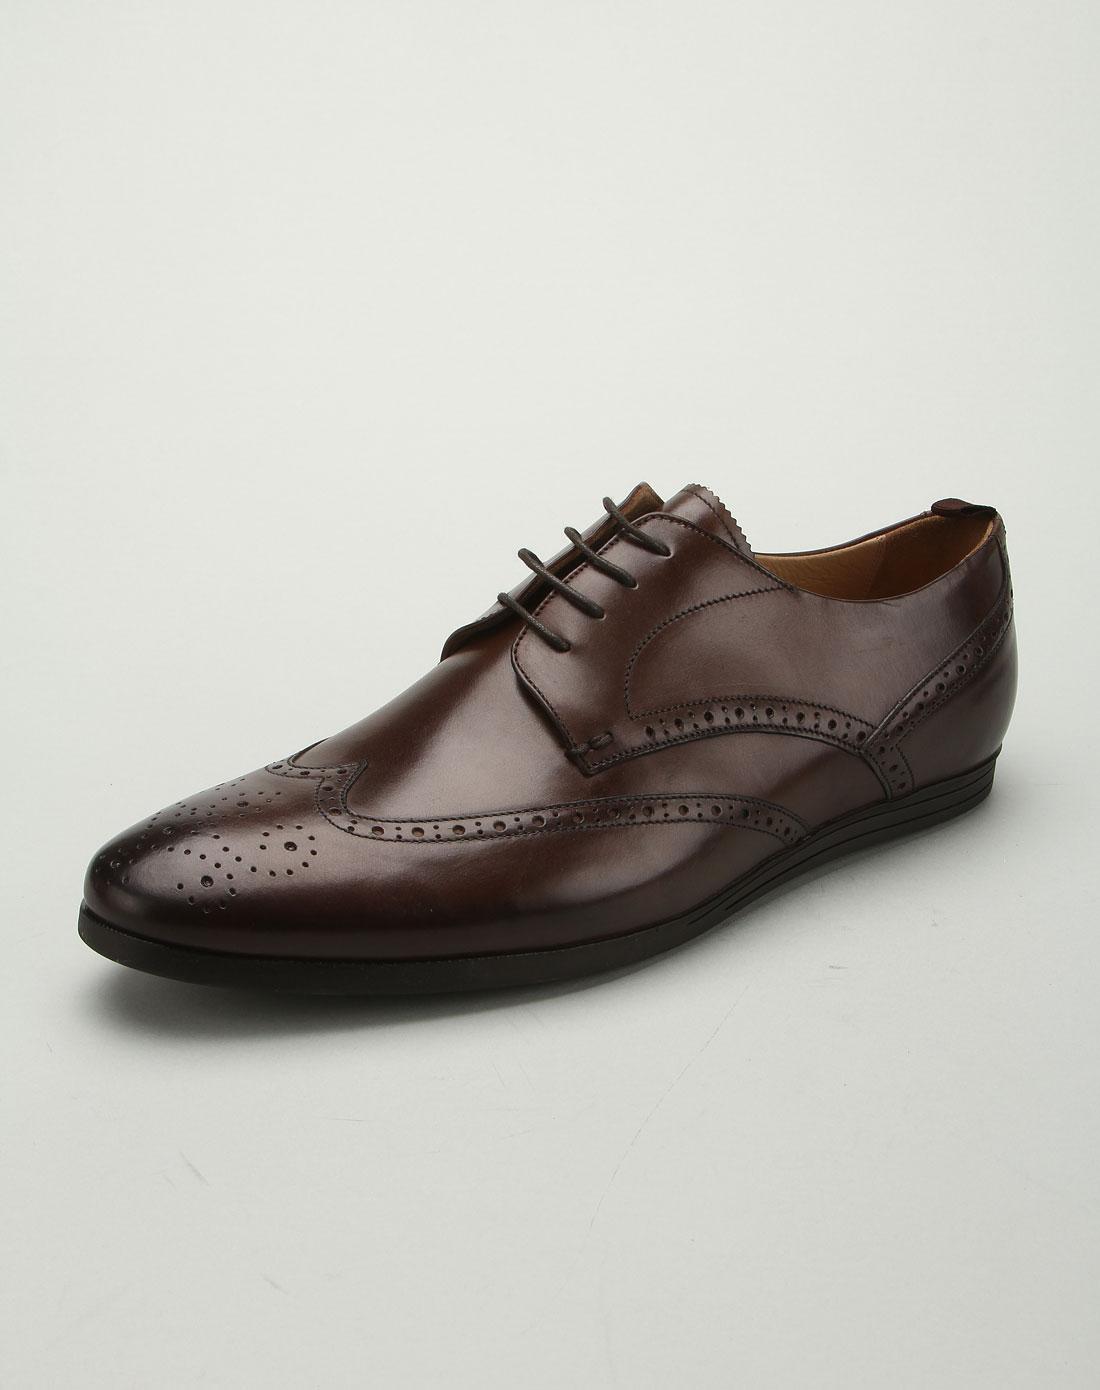 tens男士名鞋专场男款英伦风格头层牛皮皮鞋咖啡色